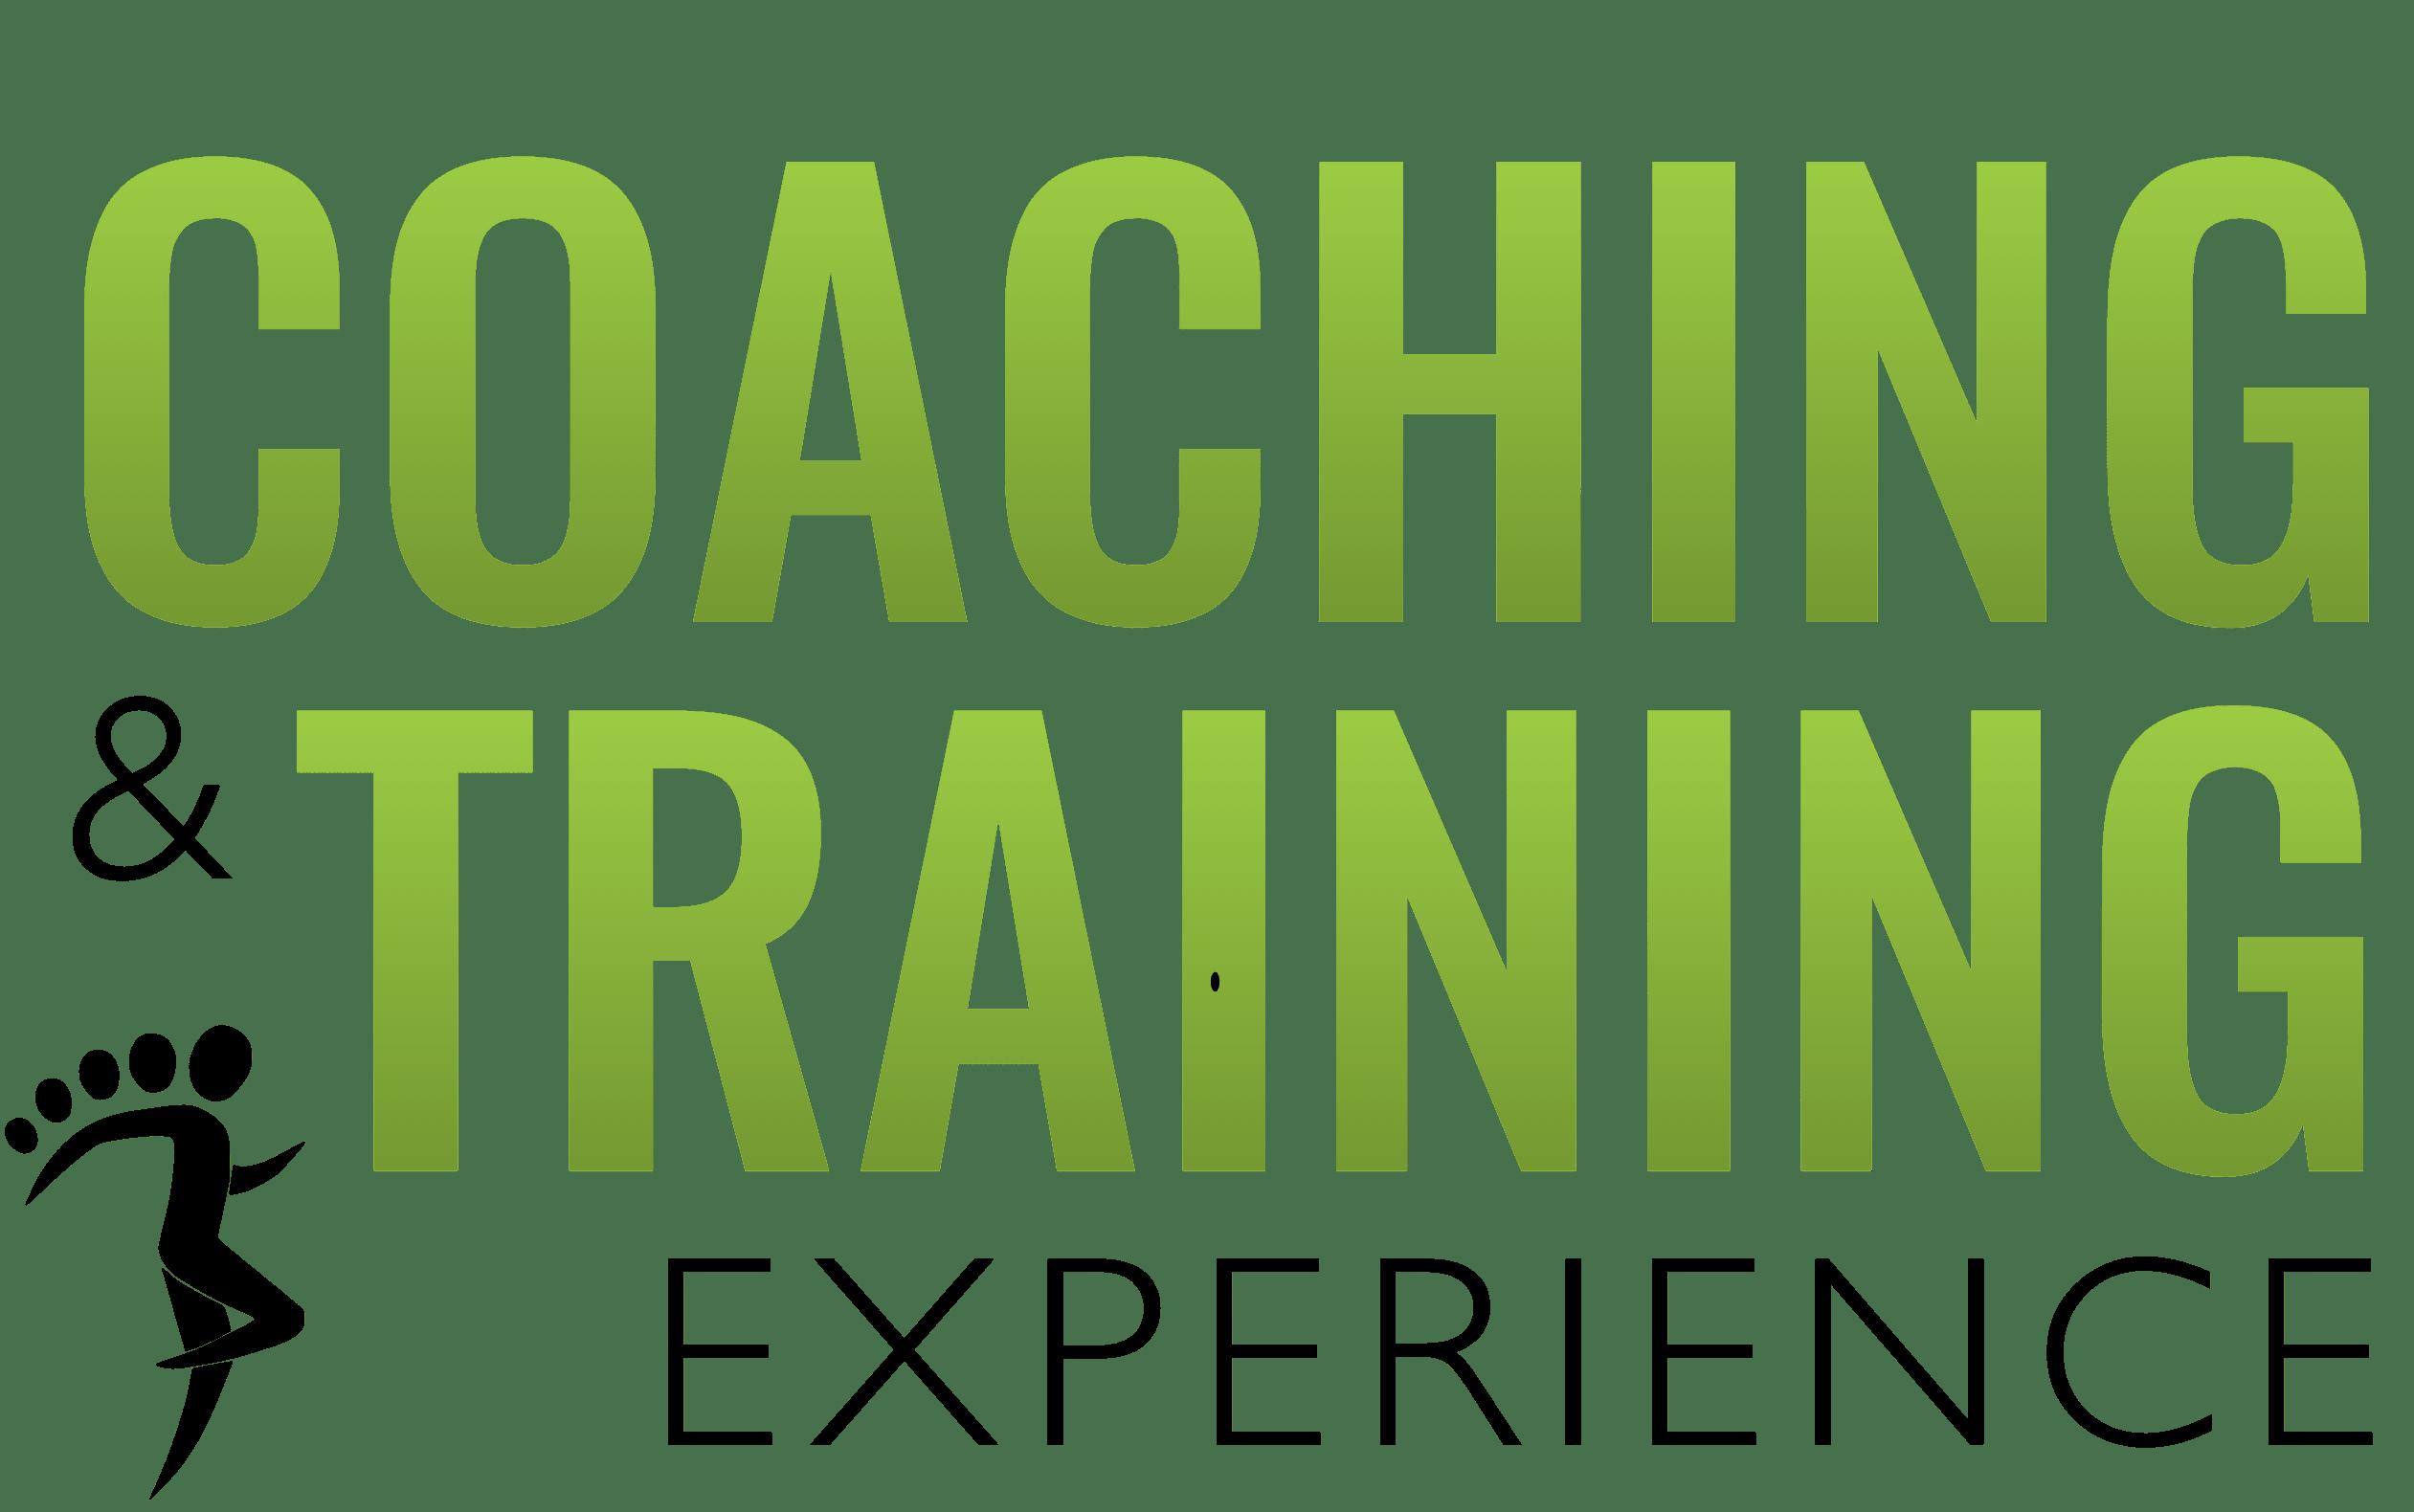 Coaching & Training Experience